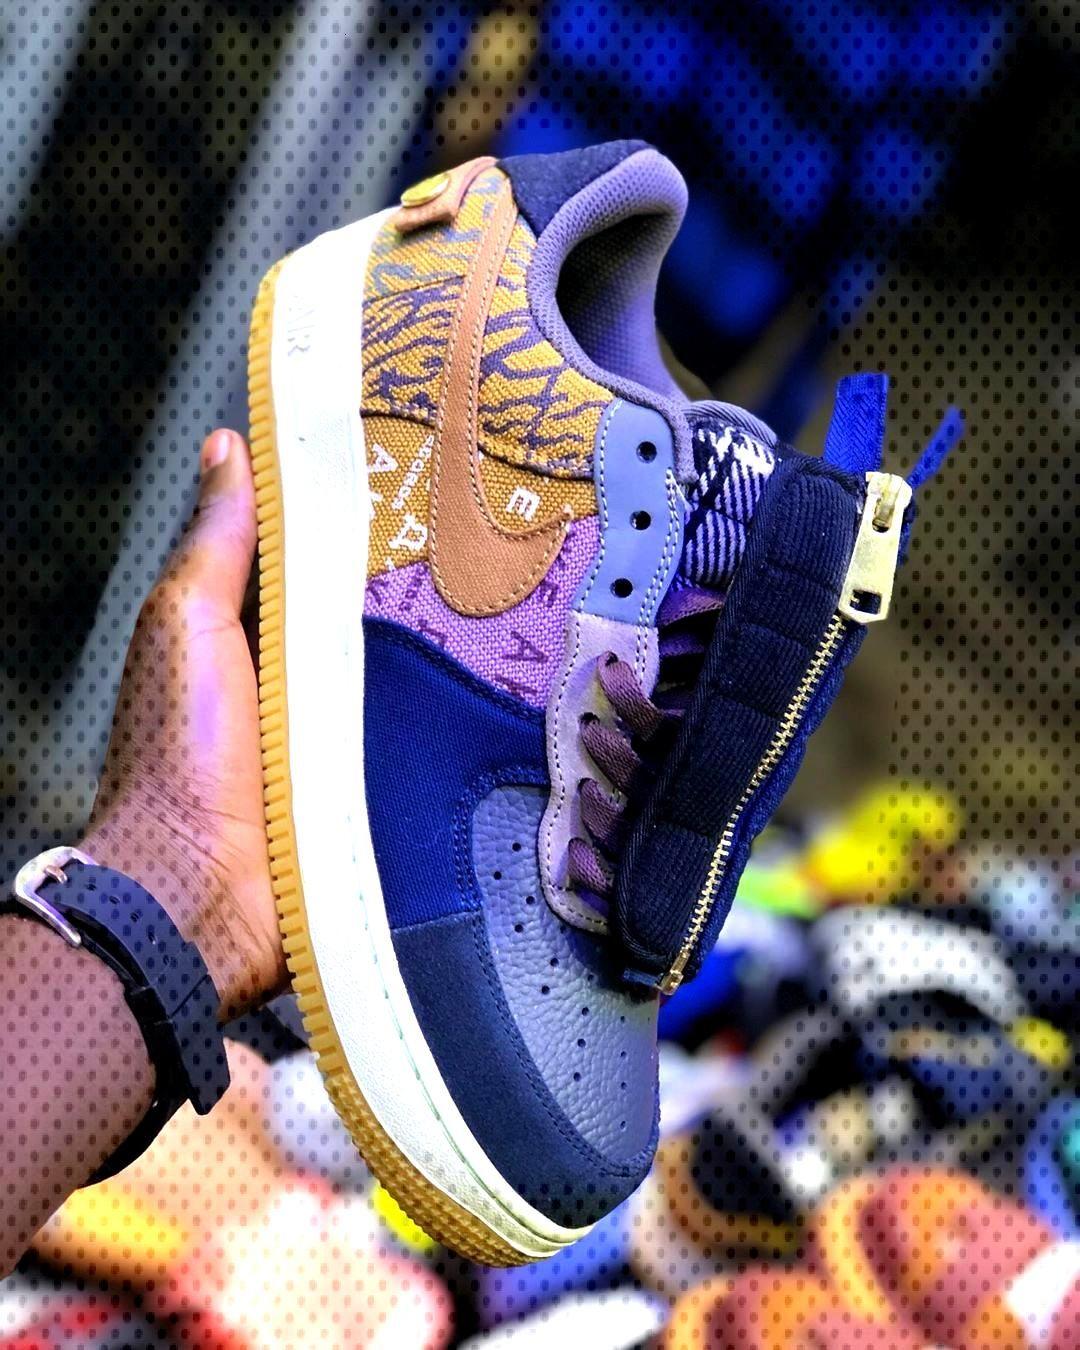 Travisscott Nike Air Force 1 @travisscott WhatsApp +237694489586